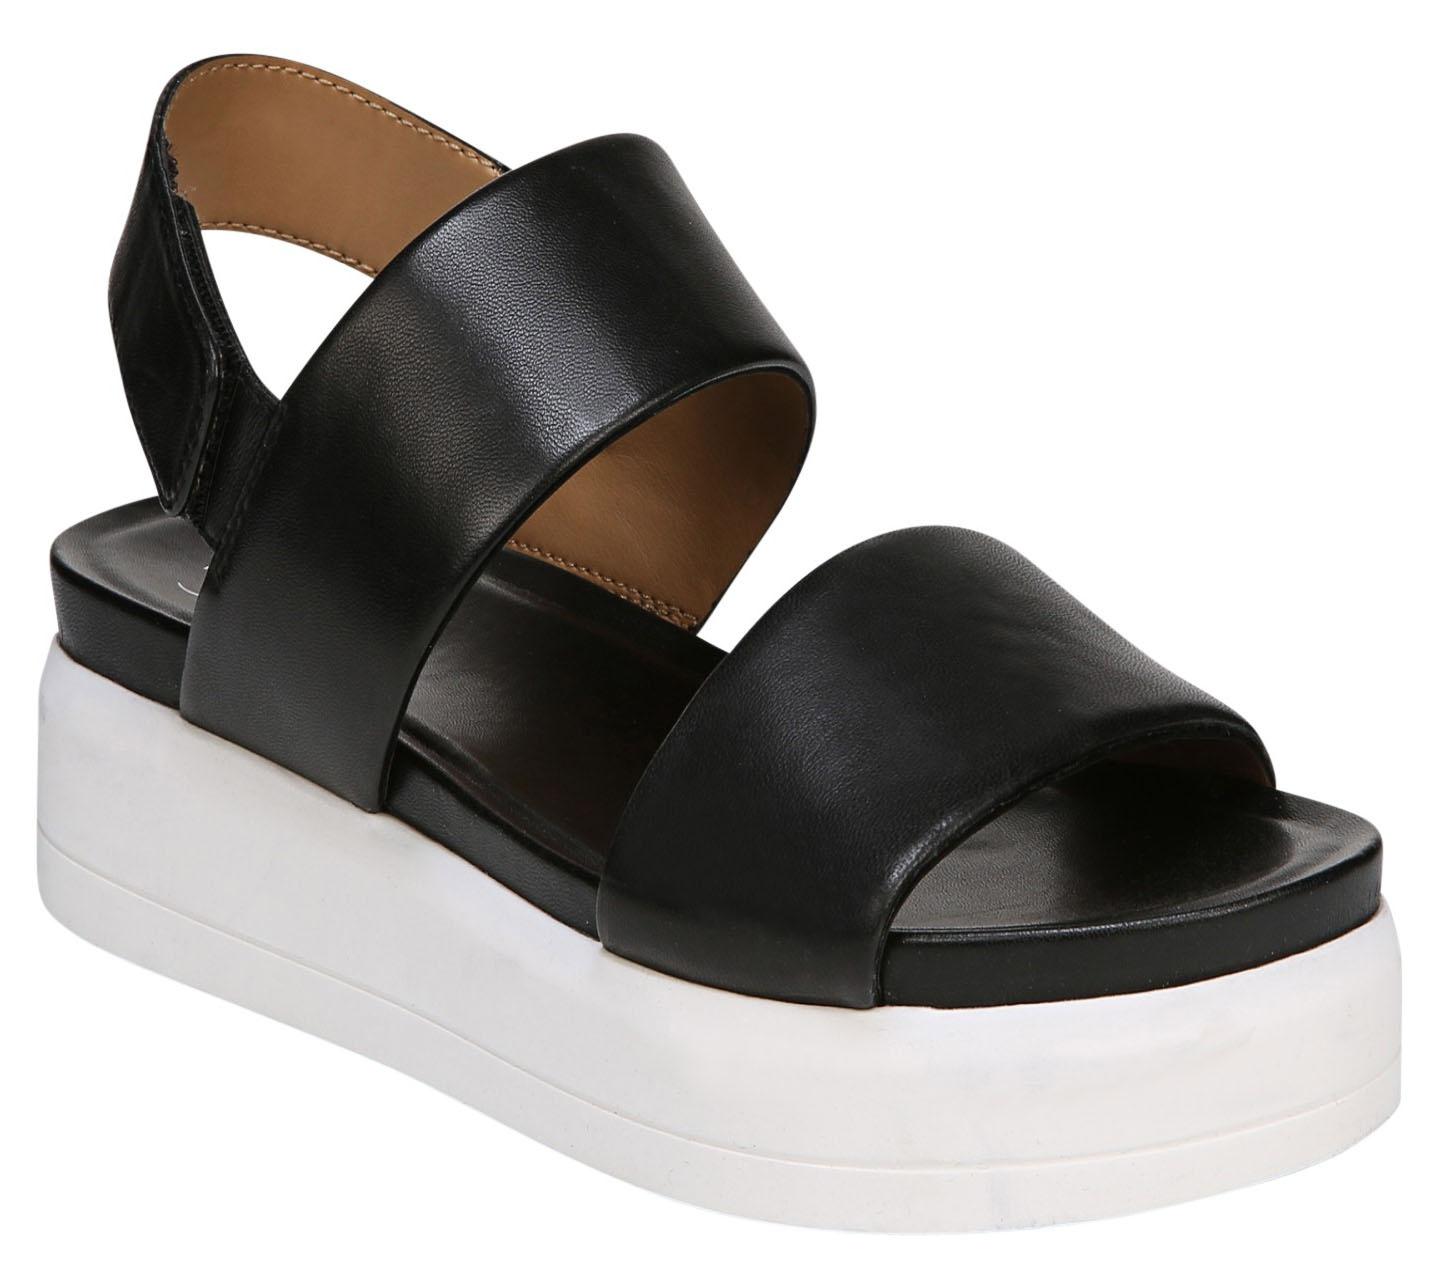 Kenan Platform Sandals